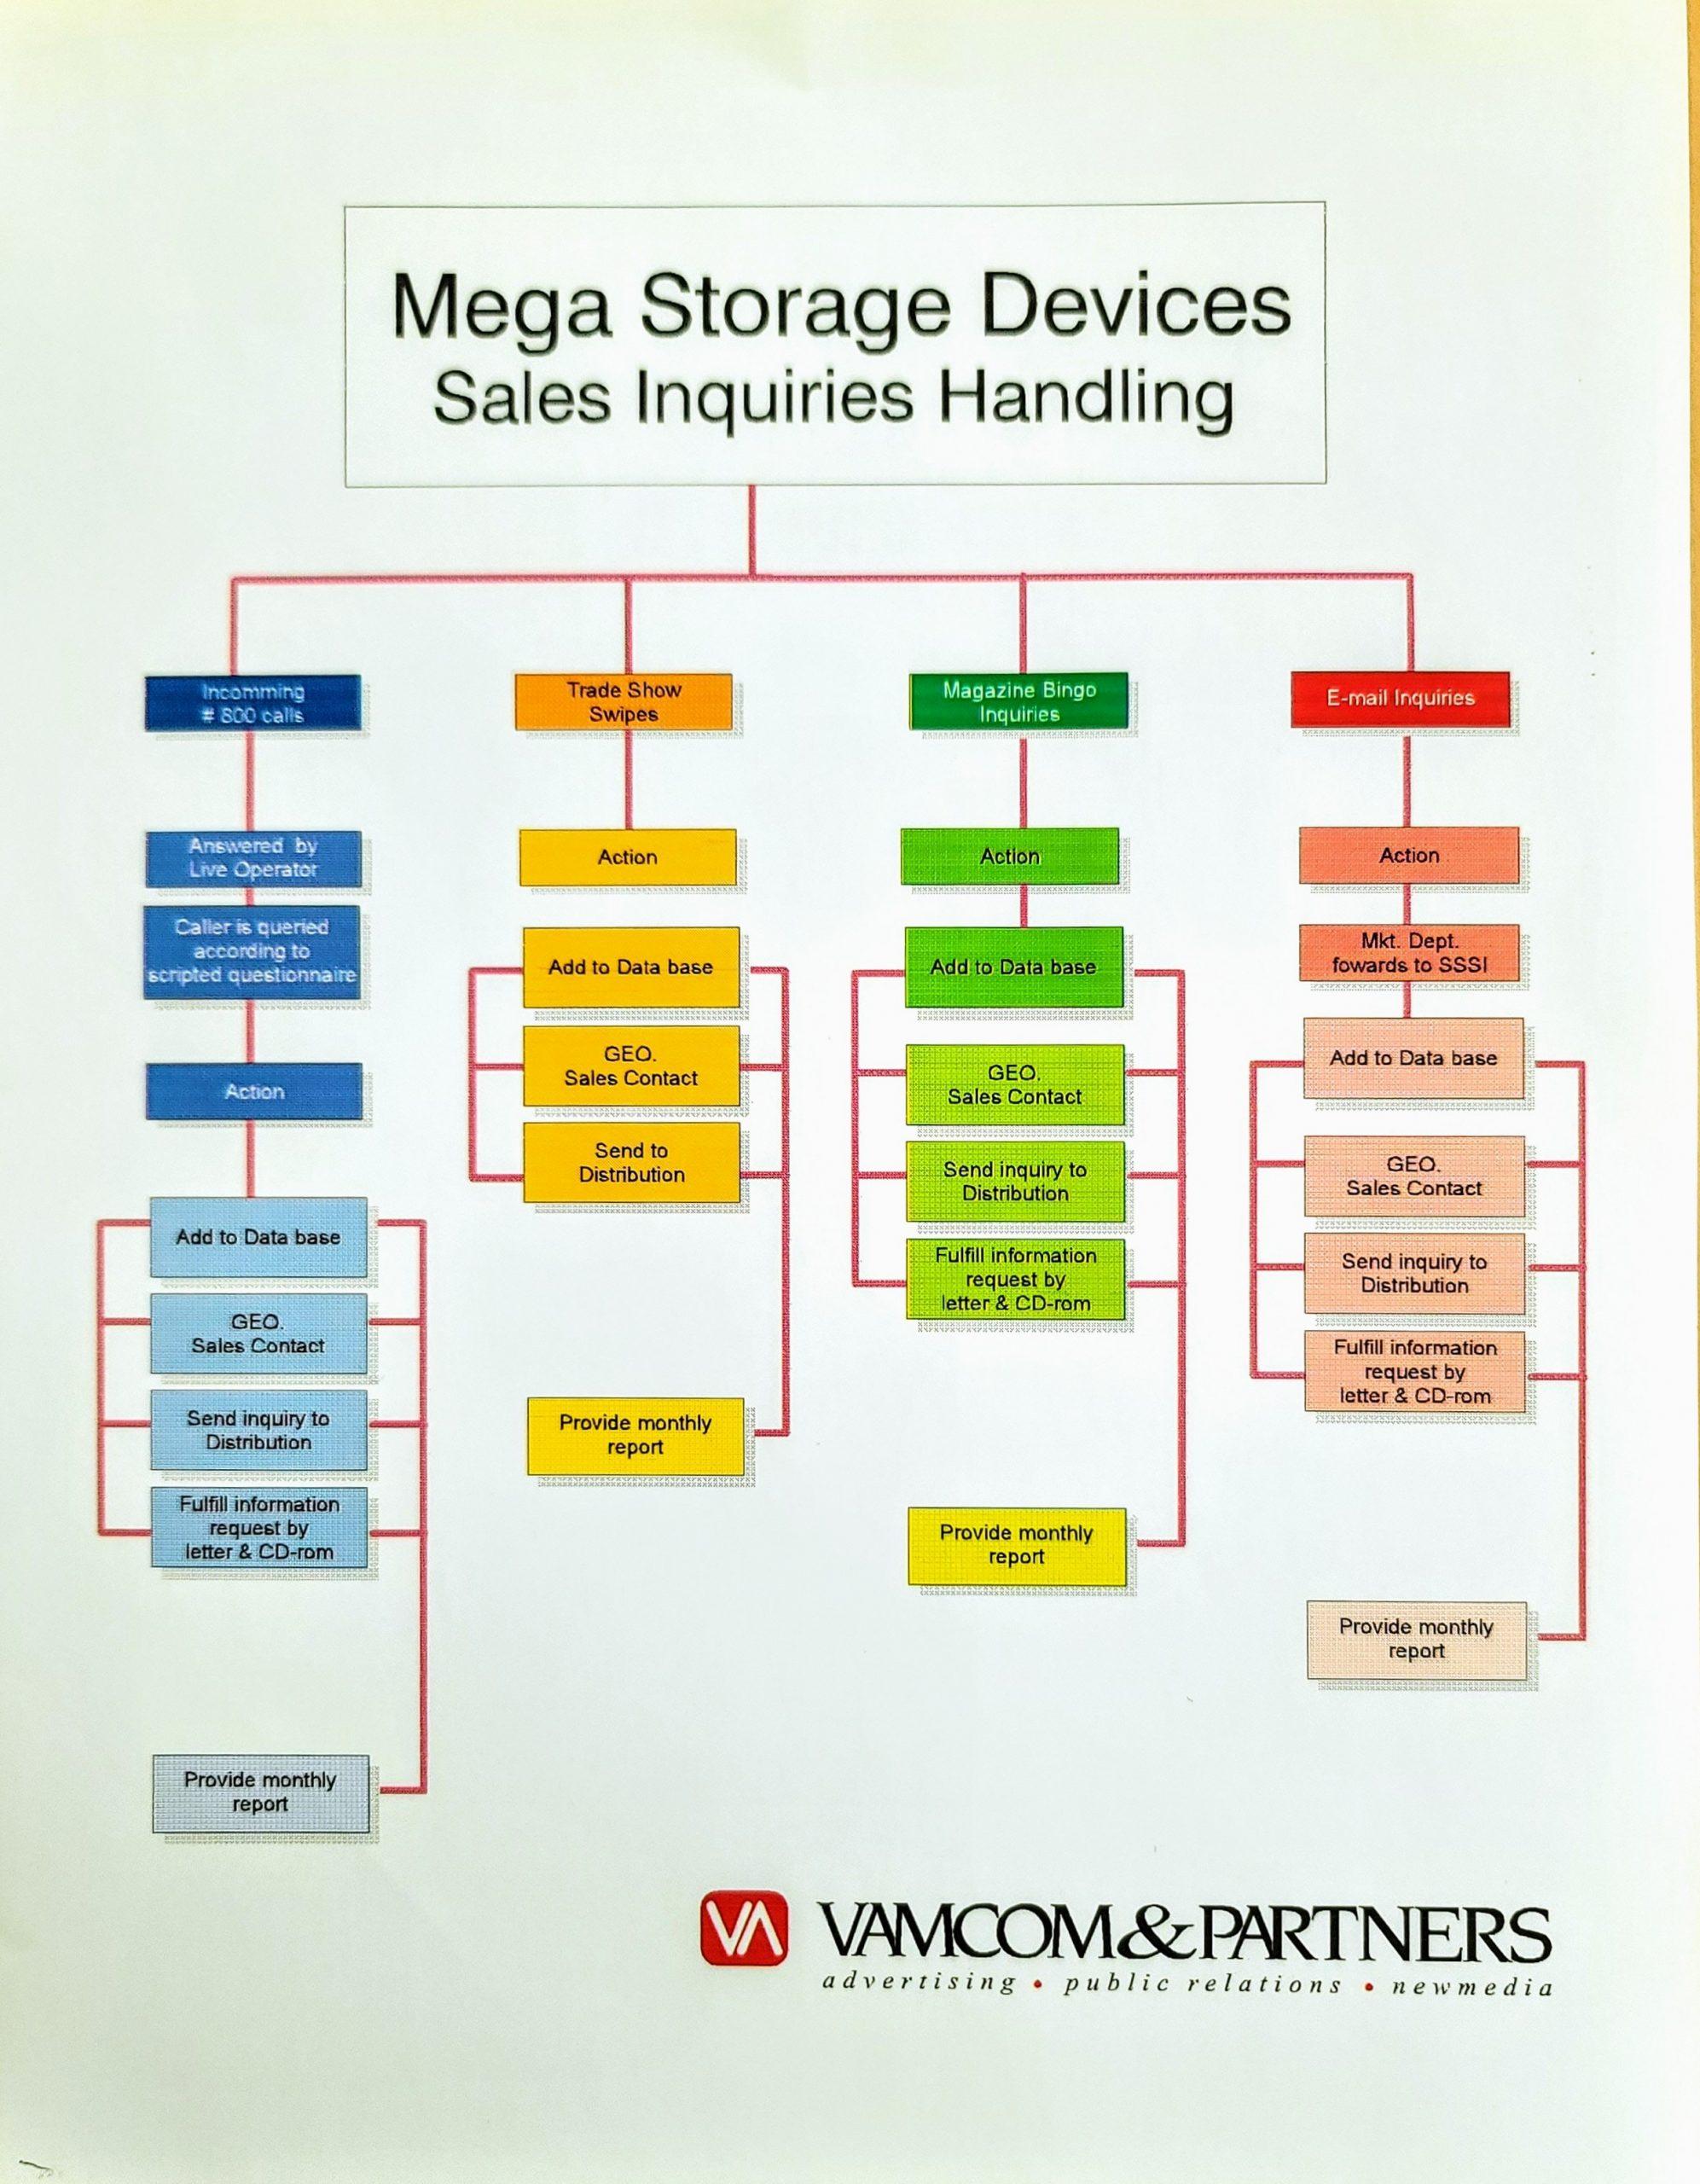 panasonic_mega storage_sales inquiries handling_4